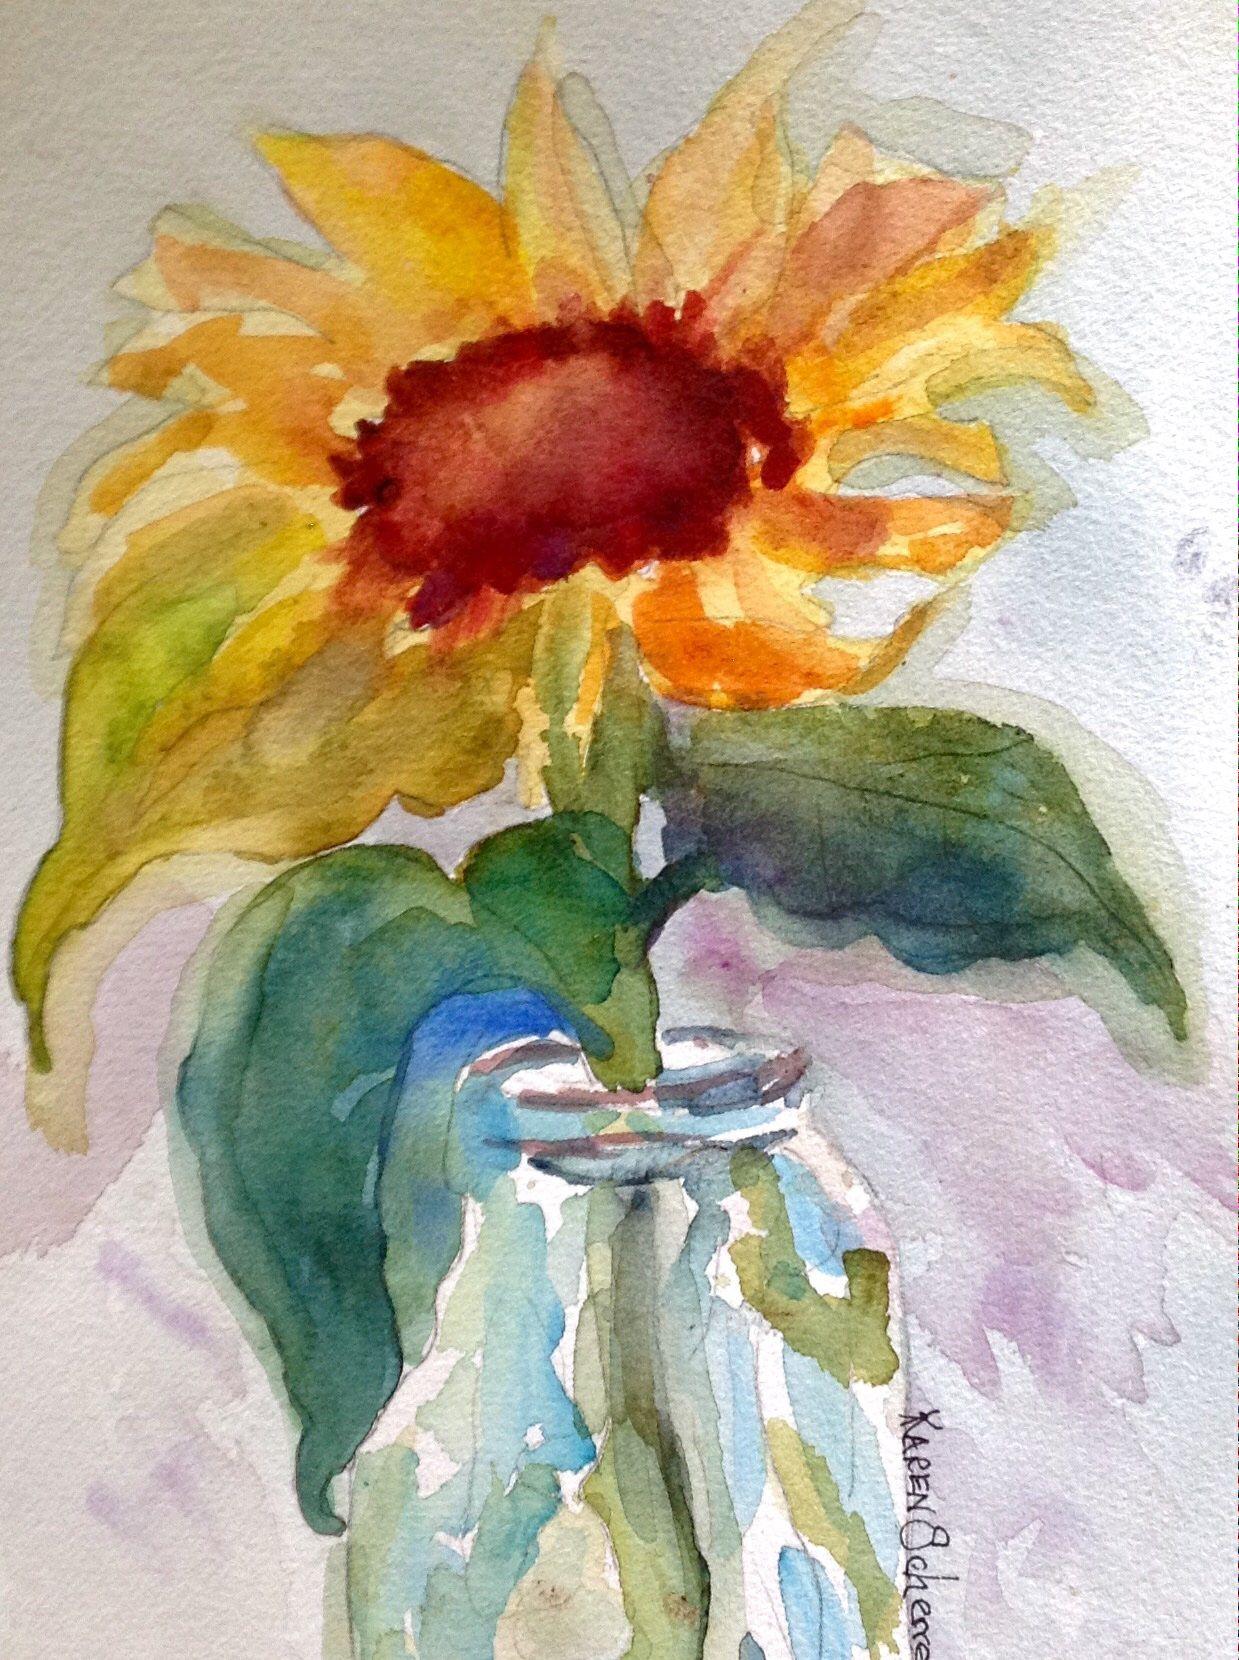 Watercolor artist in texas -  Saturday S Sunflower By Texas Watercolor Artist Karen Scherrer